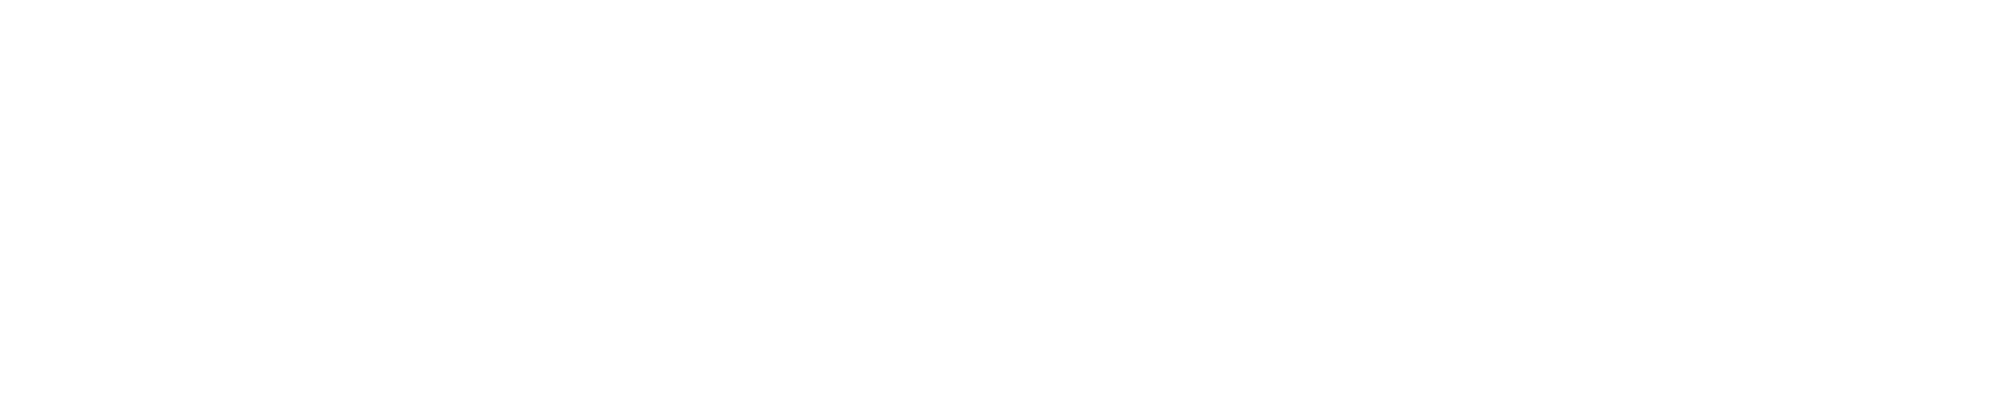 Fossello's Quality Clothing Inc